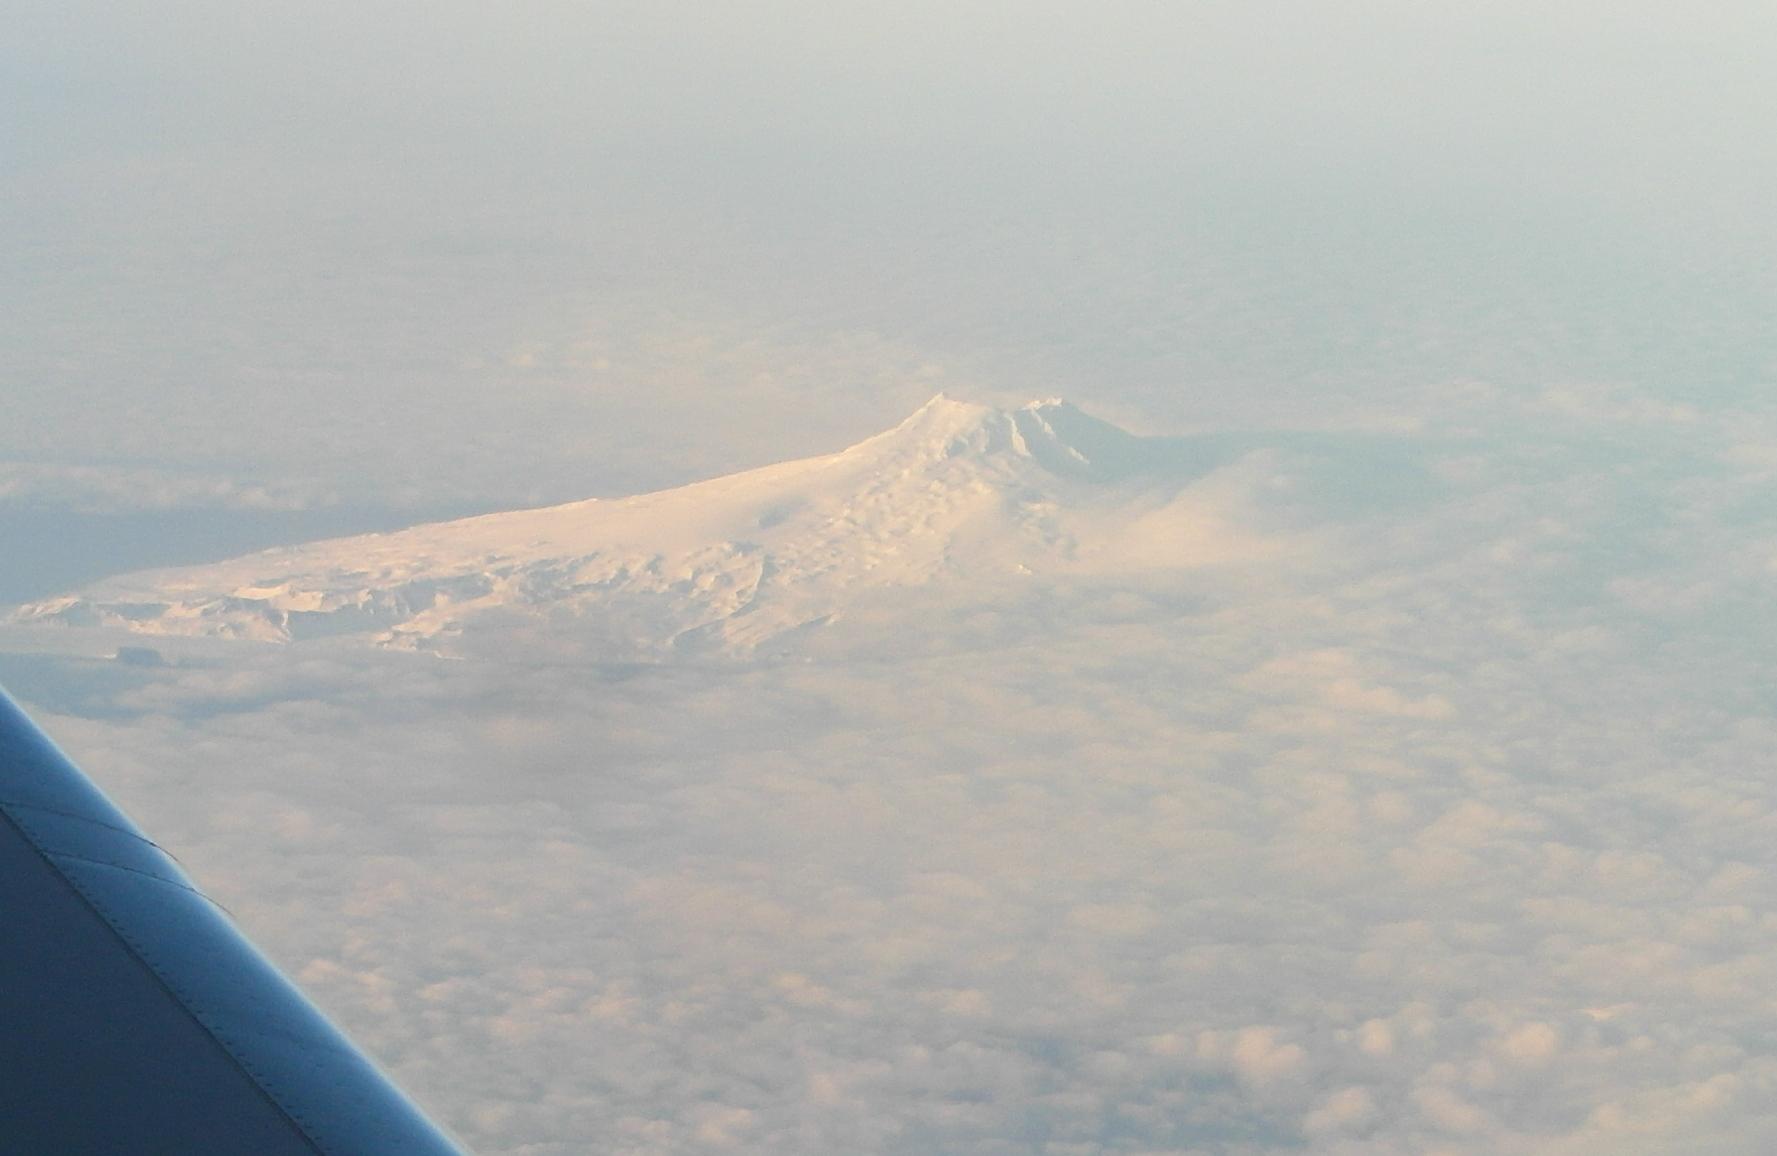 Beerenberg volcano on Jan Mayen. Picture by Thomas Gulde, KIT.